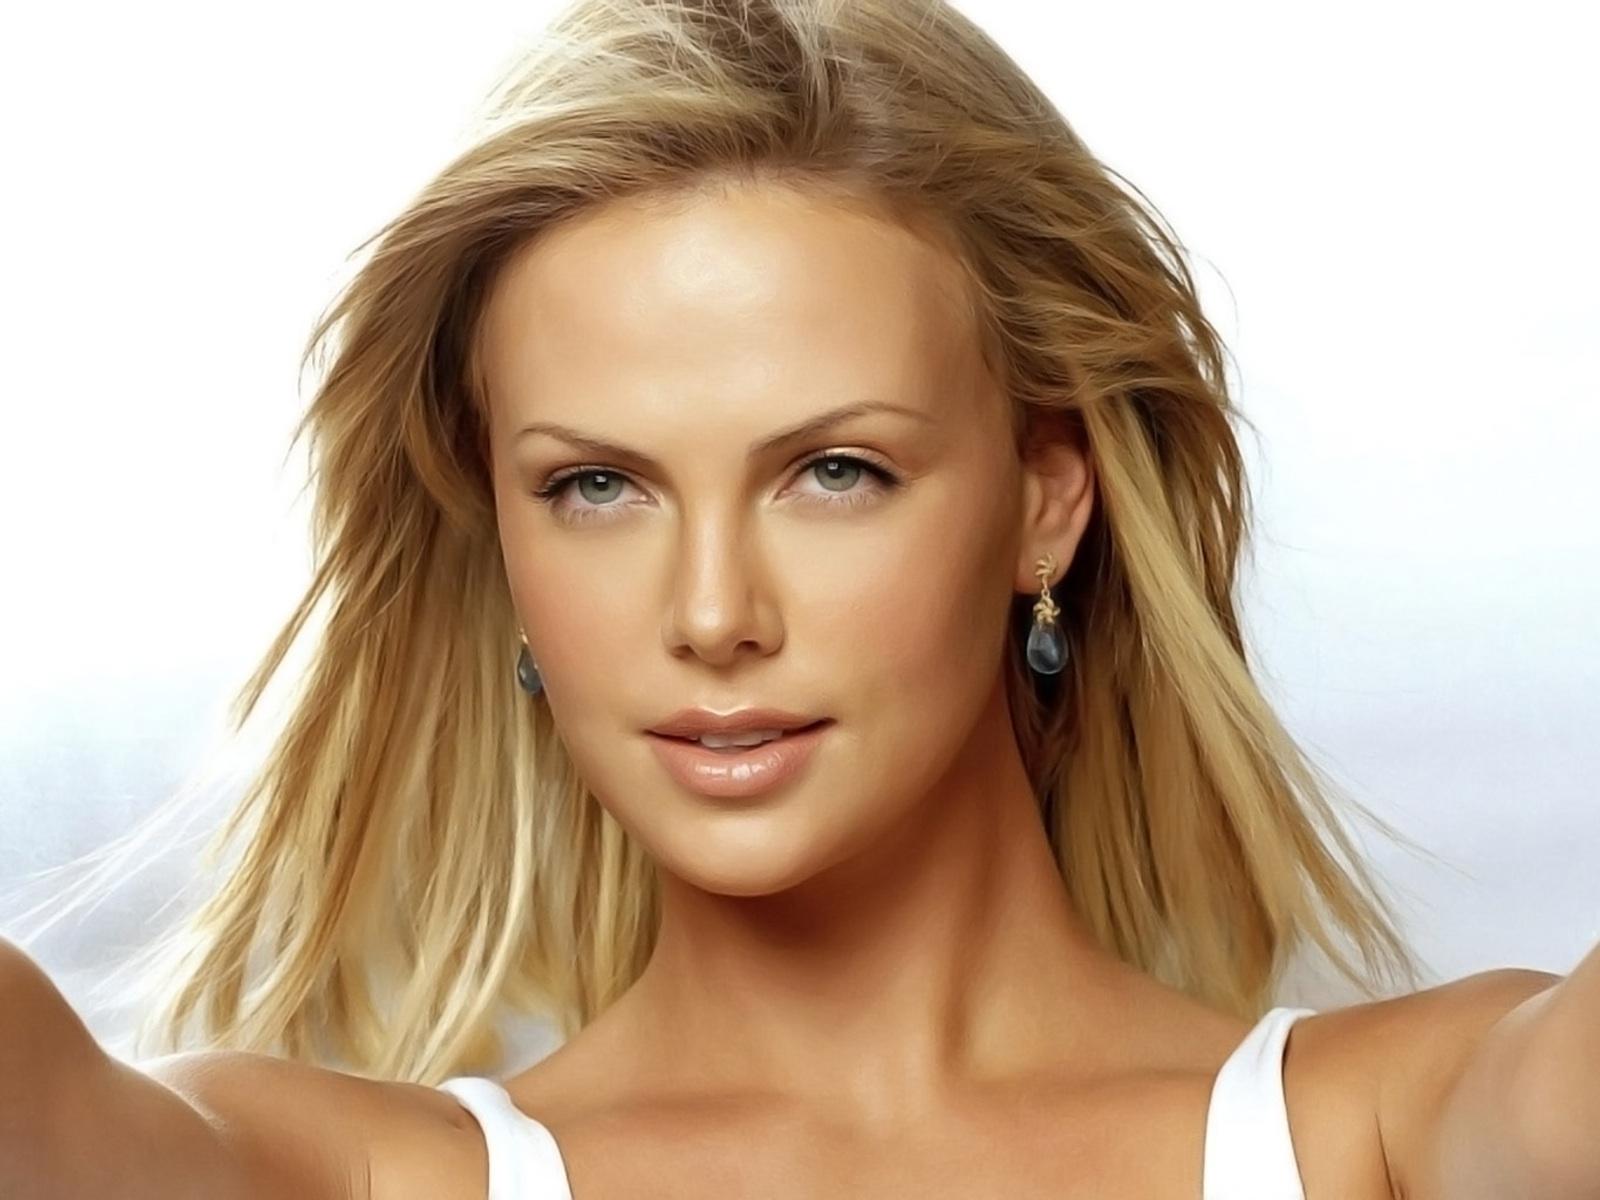 http://1.bp.blogspot.com/-7NaMUjGhVMo/TkZPXgLVGyI/AAAAAAAAA5A/XJYkRYRR_jU/s1600/Charlize+Theron+%25284%2529.jpg